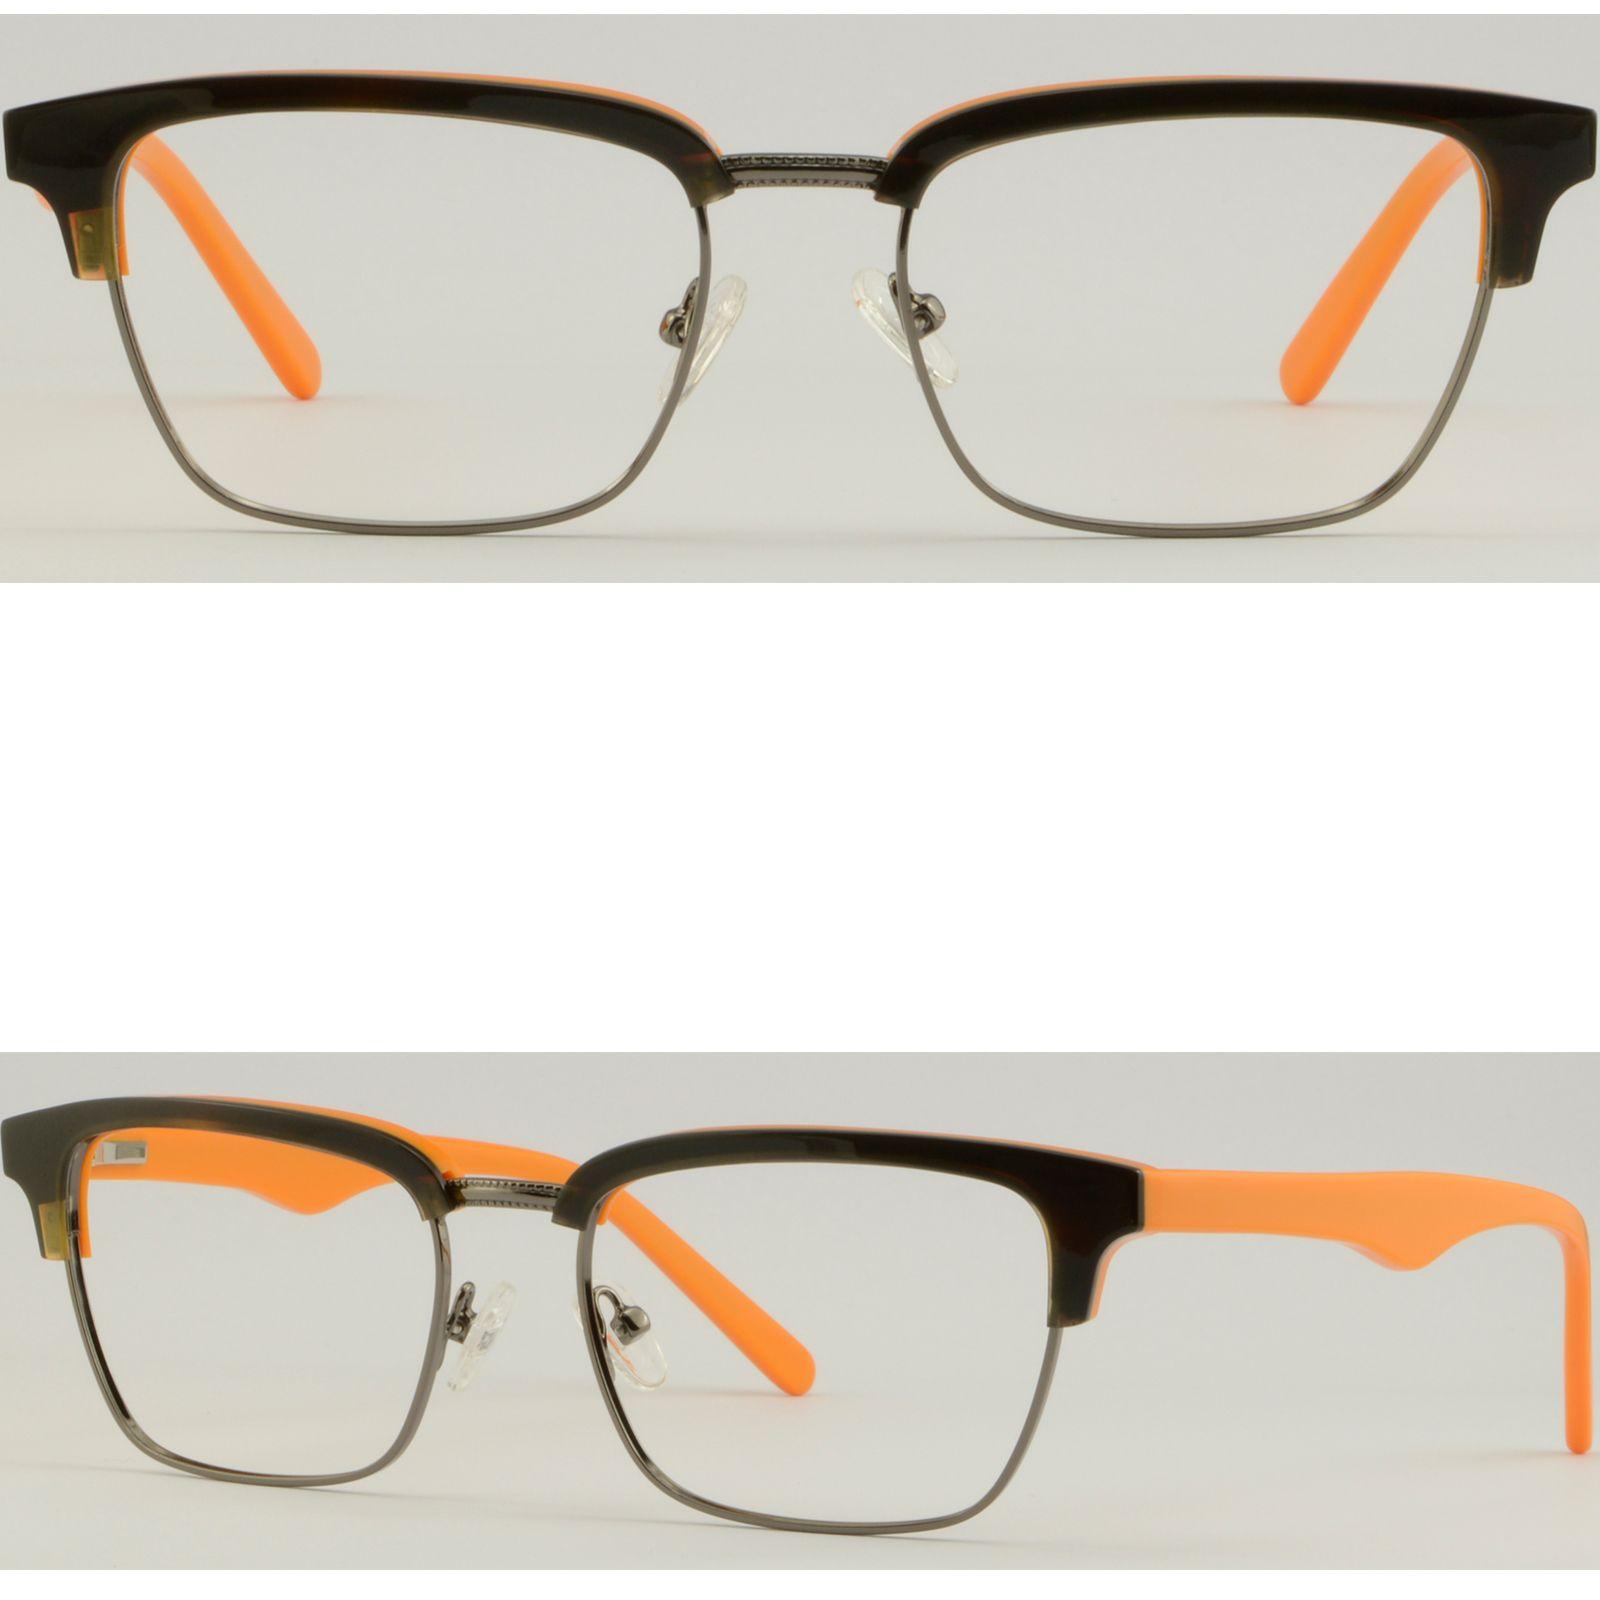 088d2298c4 Men Women Browline Frame Acetate Plastic Prescription Glasses Spring Hinge  Black Glasses Frame Online with  43.06 Piece on Aceglasses s Store